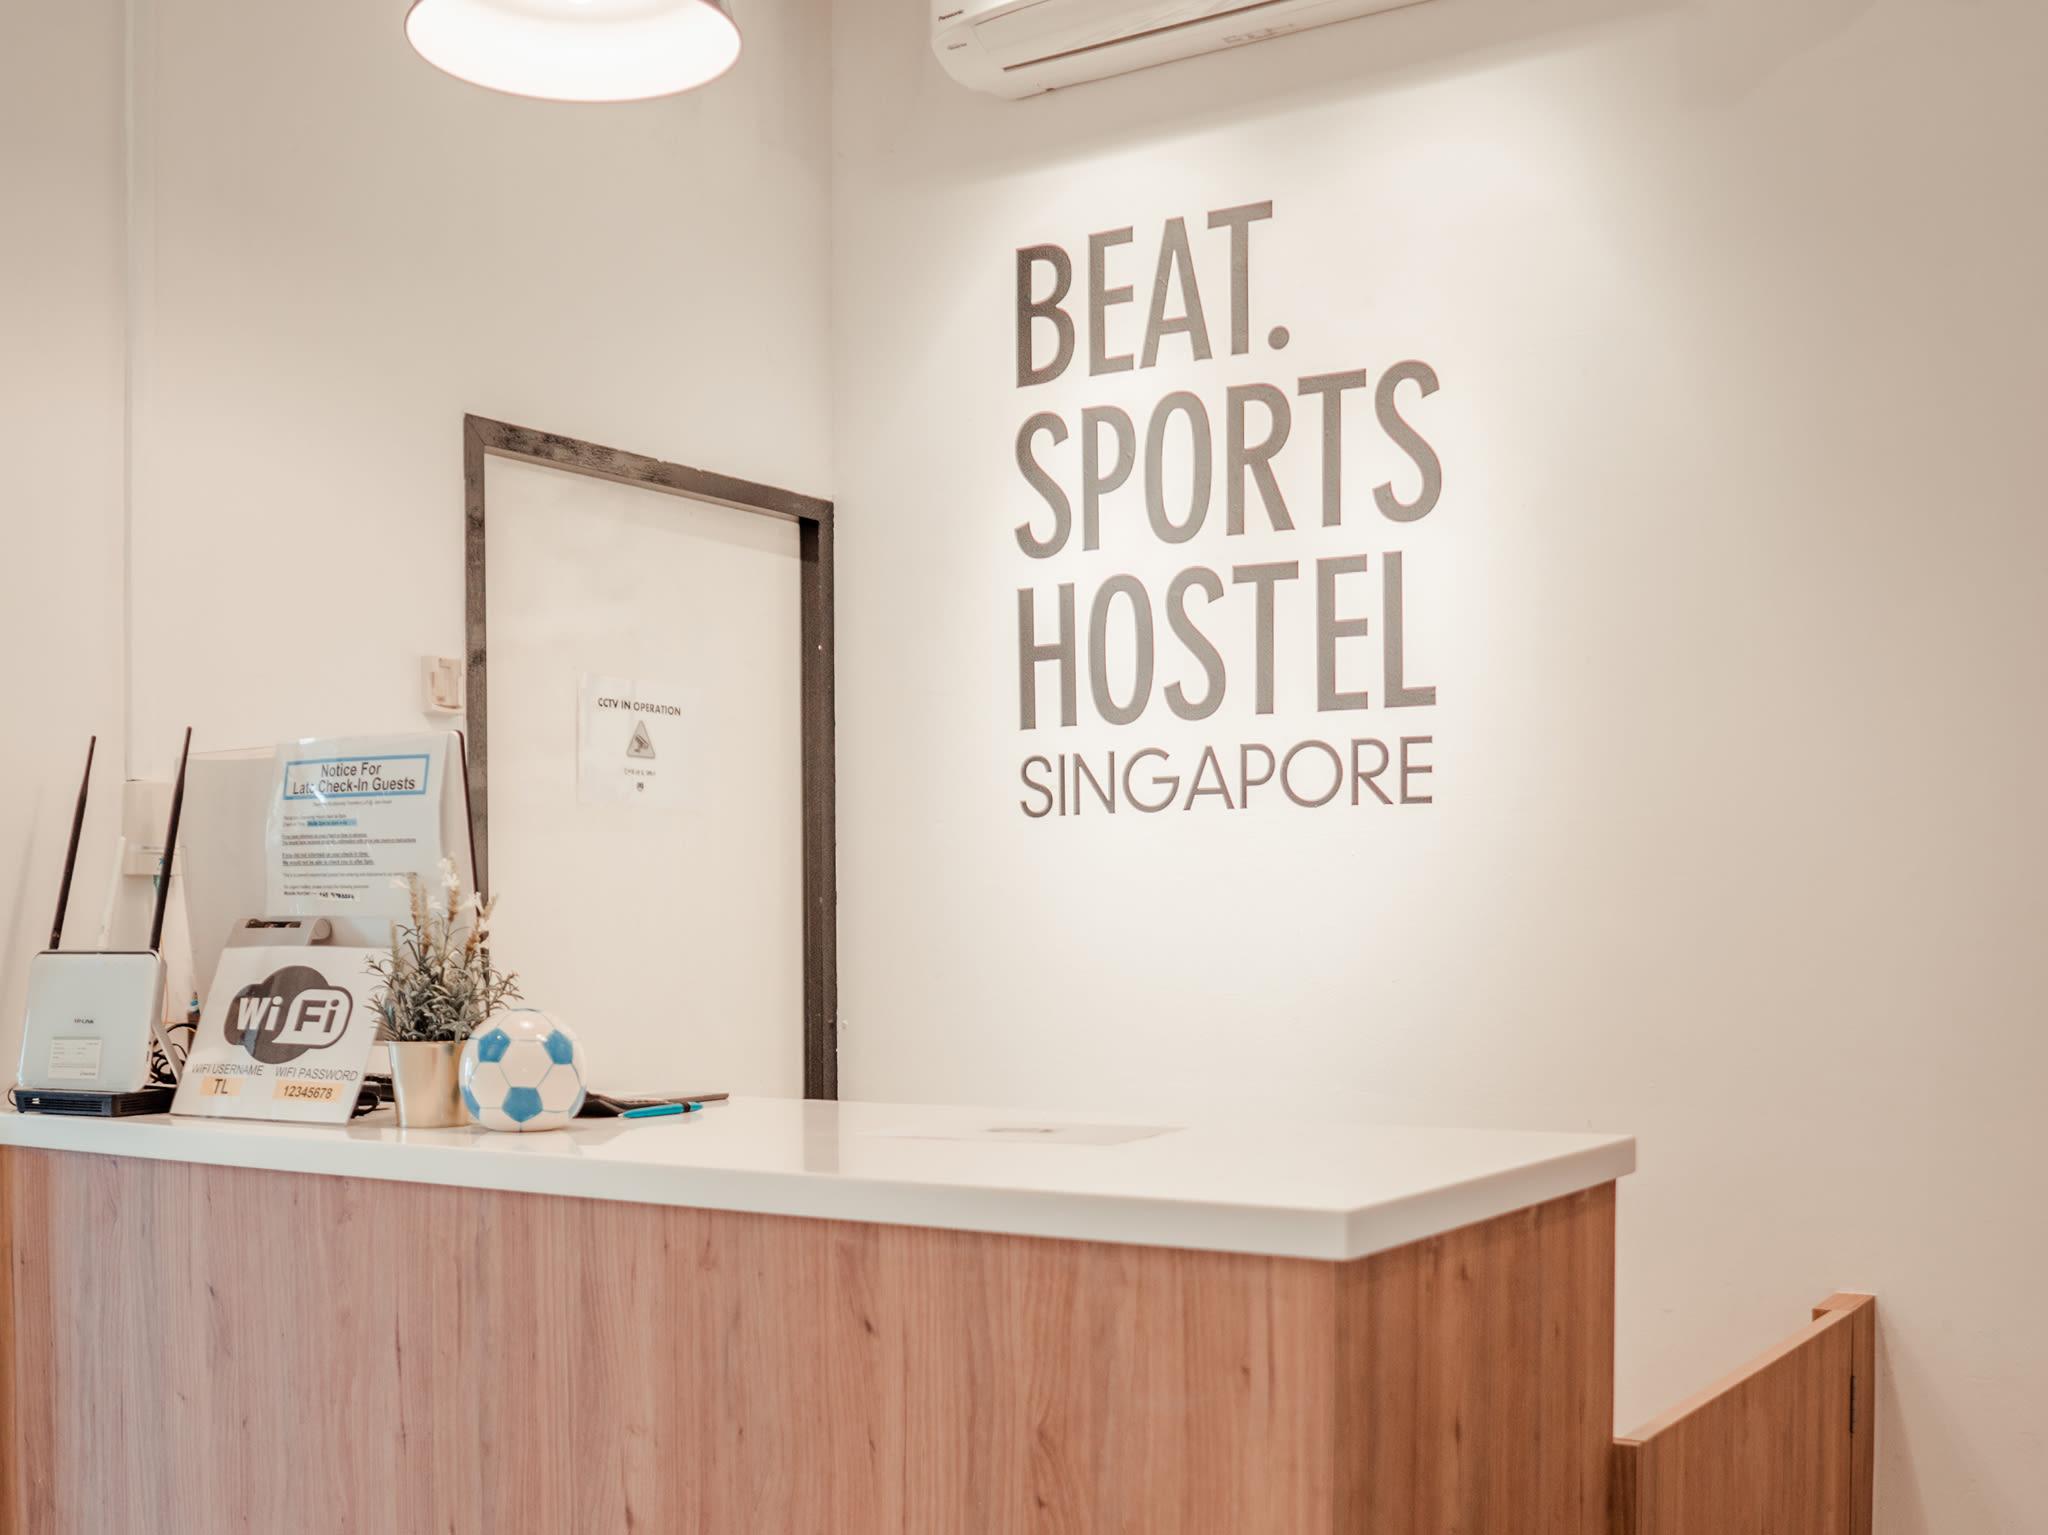 HOSTEL - BEAT. Sports Hostel